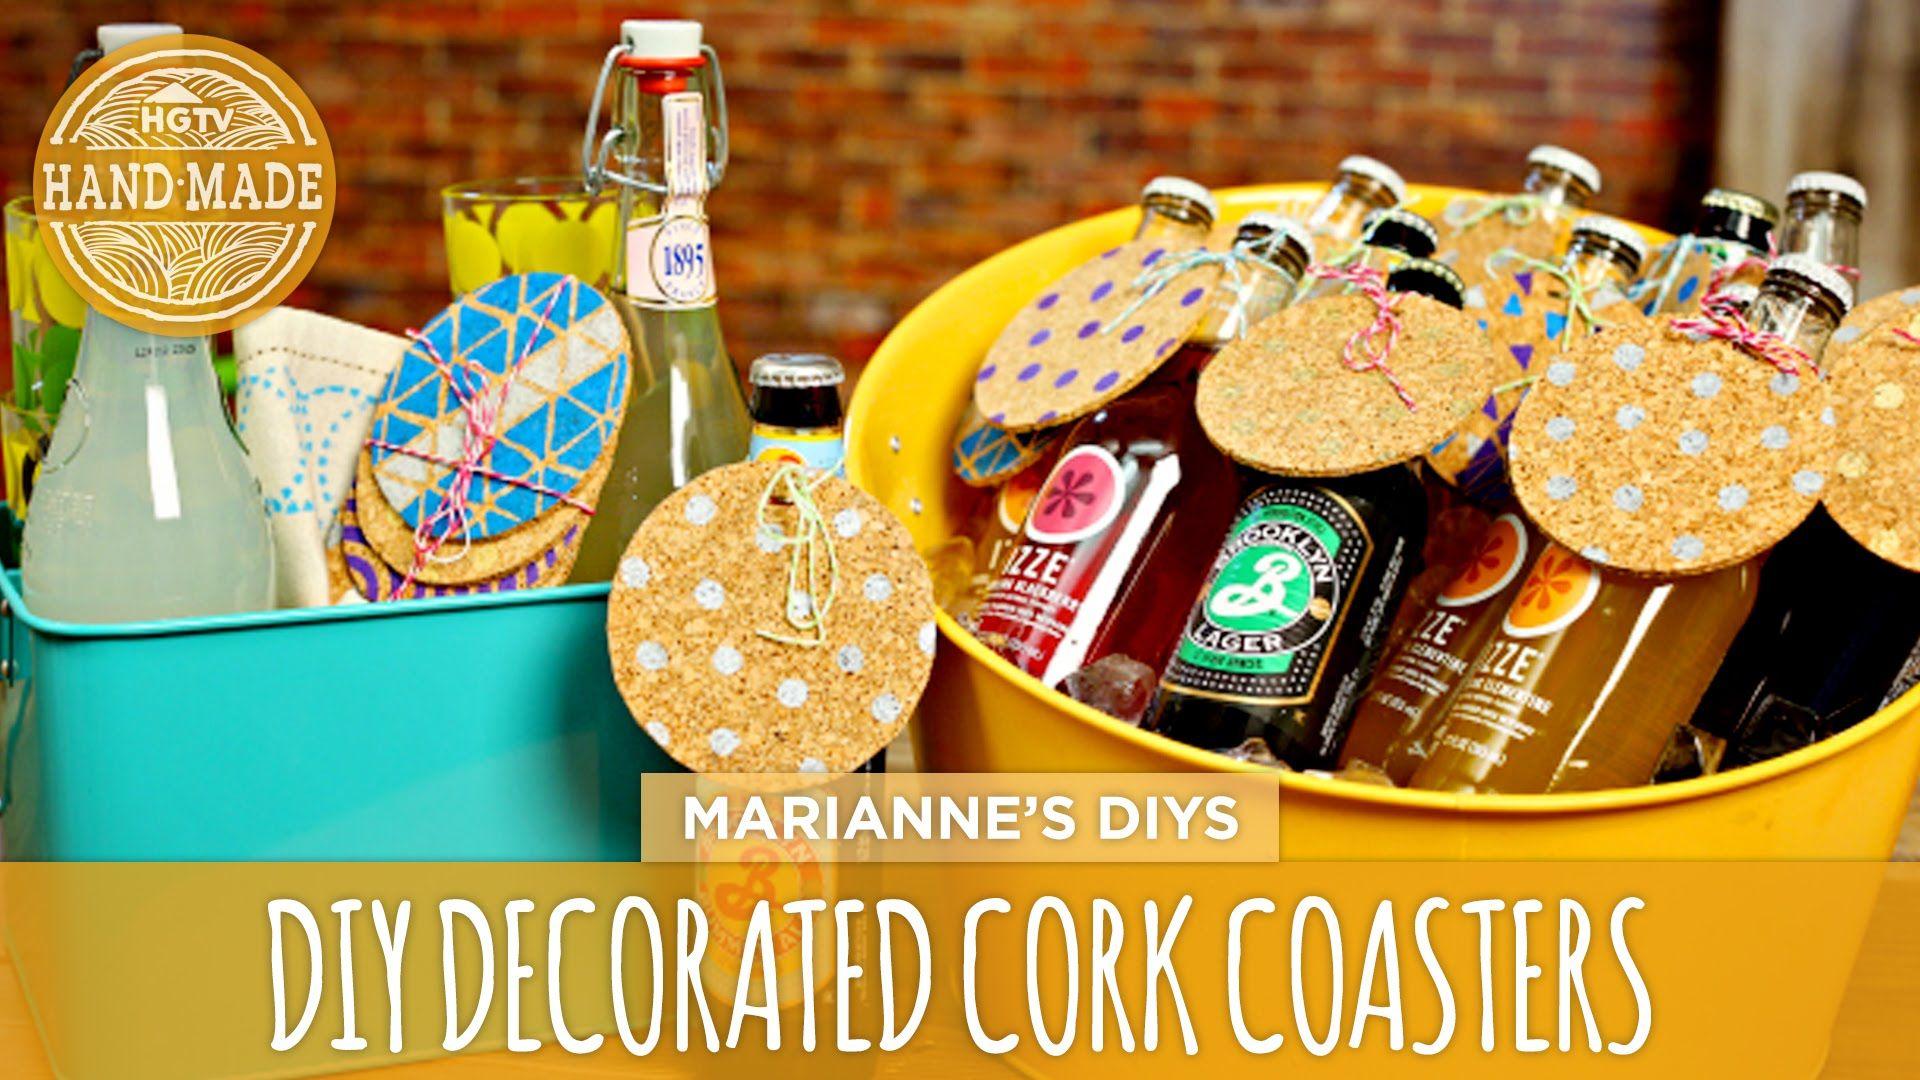 Diy decorated cork coasters hgtv handmade cork